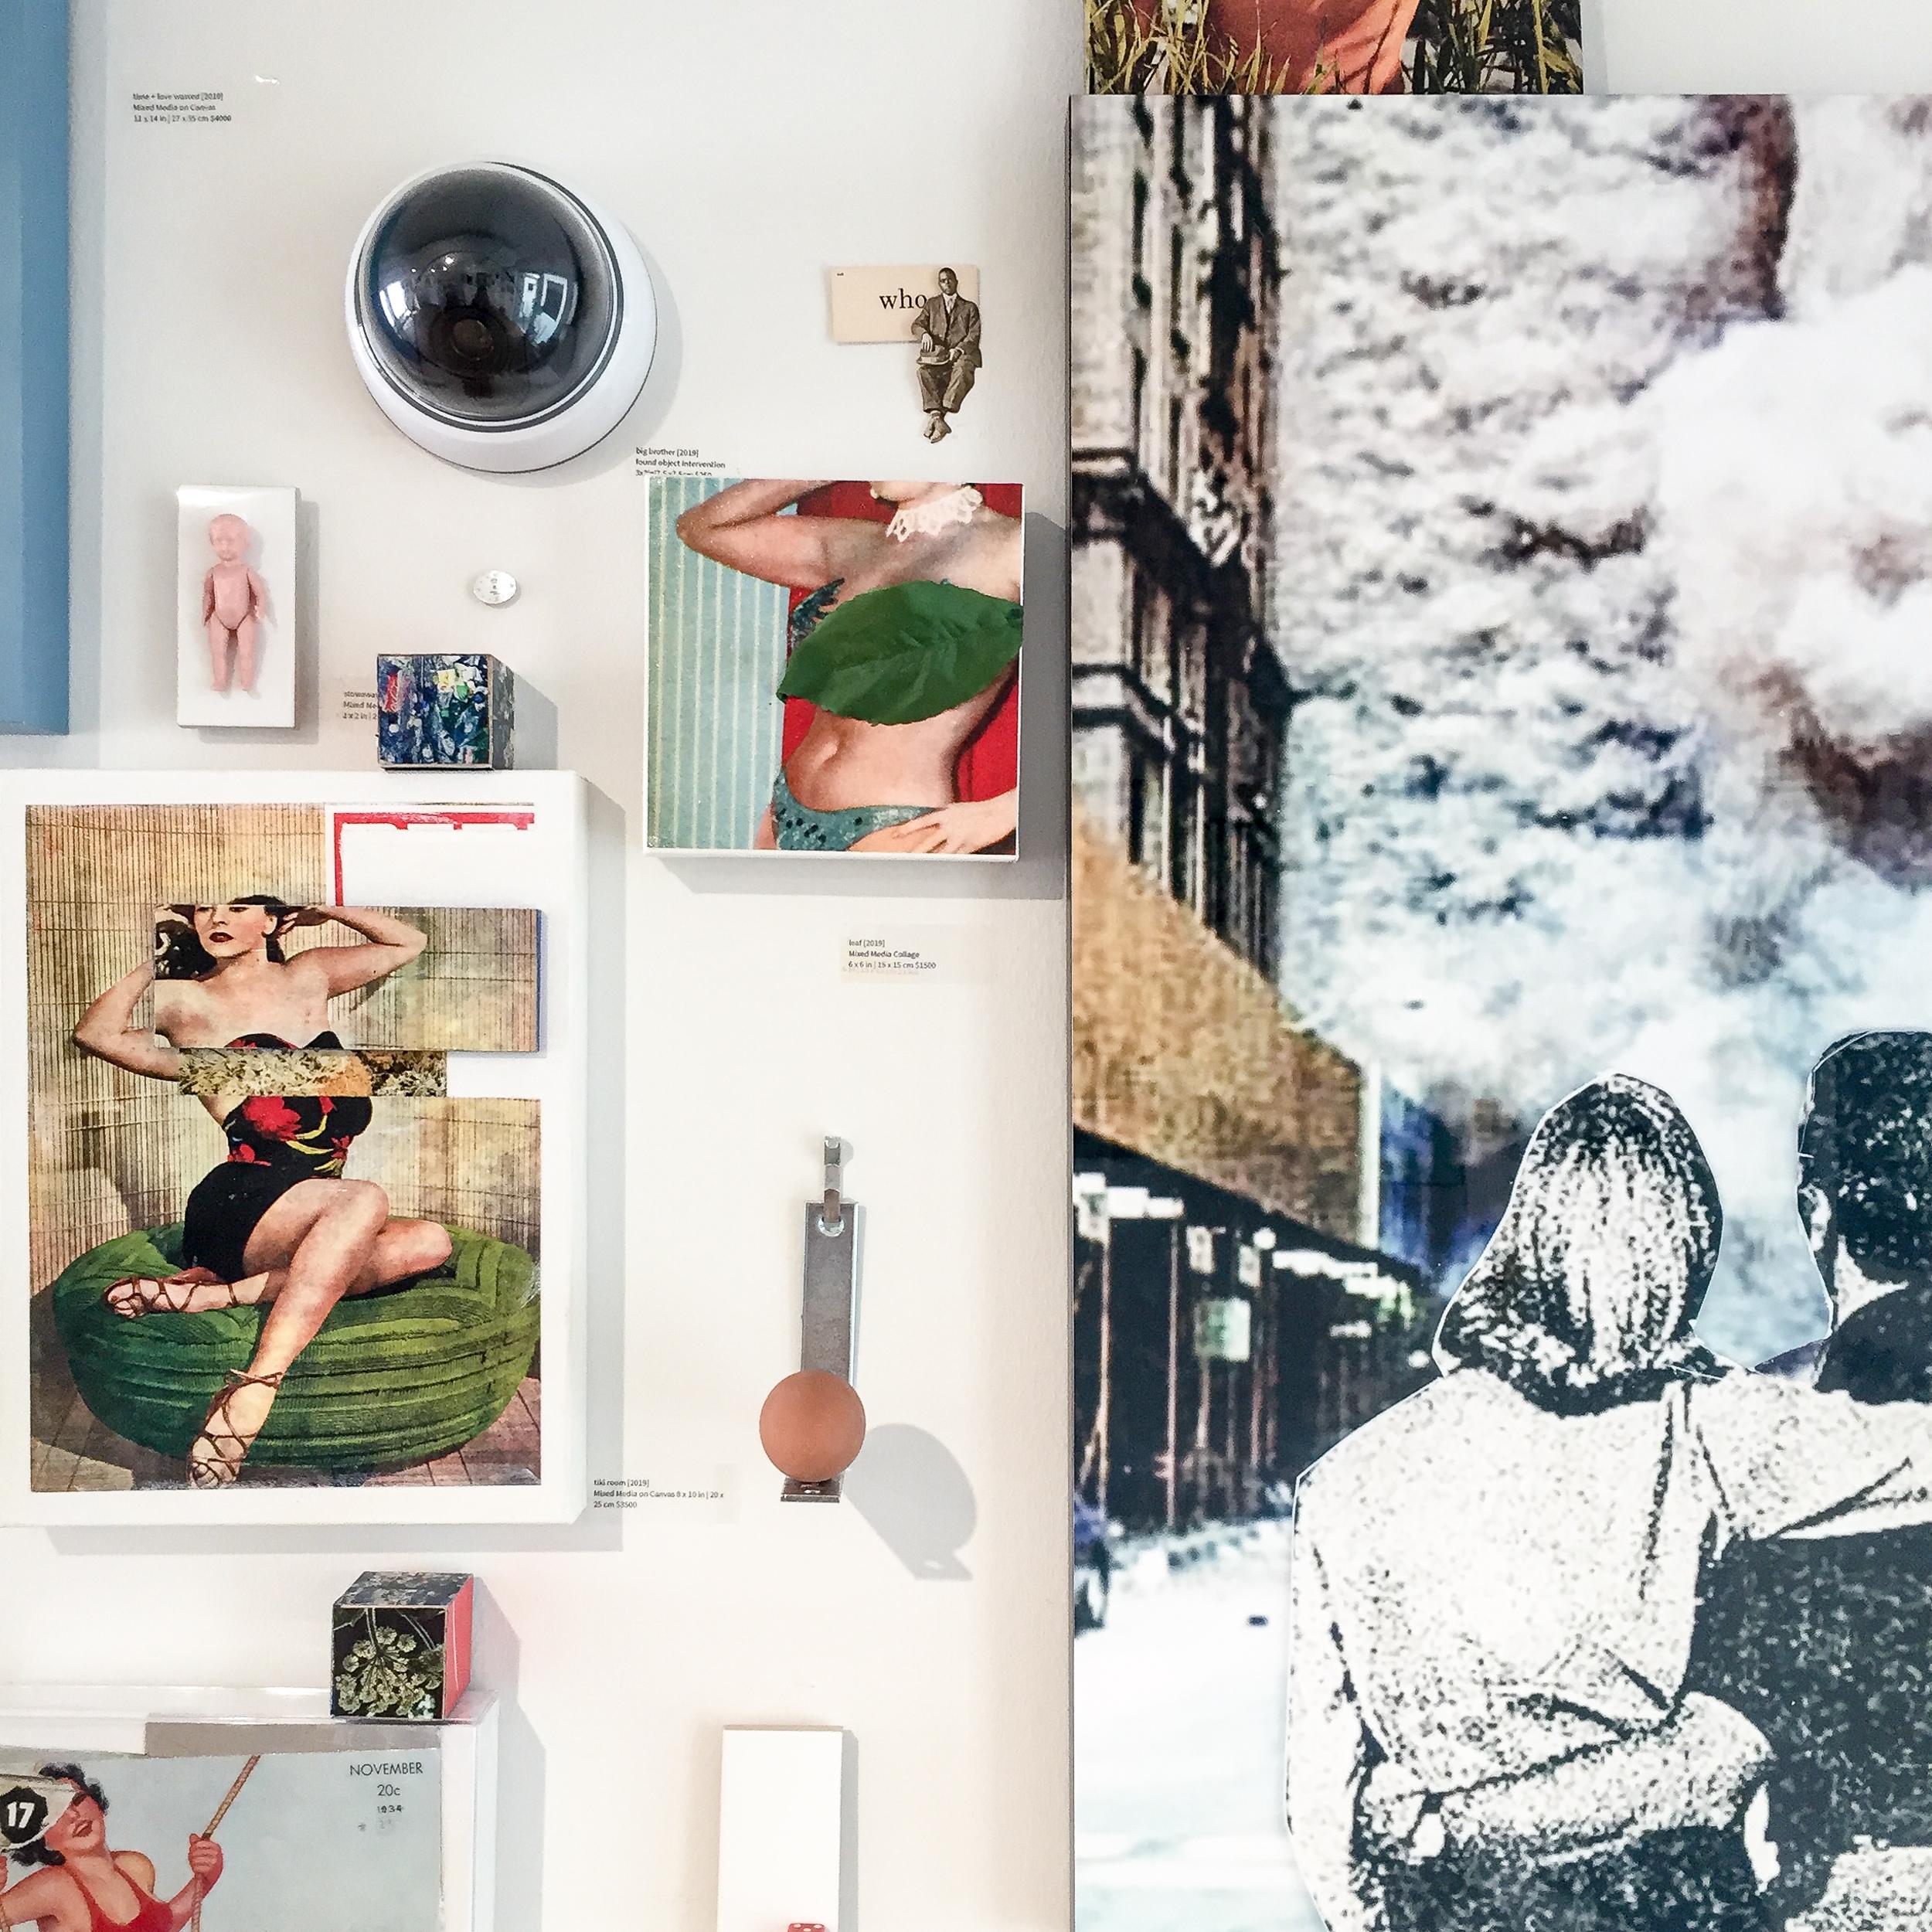 Faena-Exhibition-Images-83.jpg